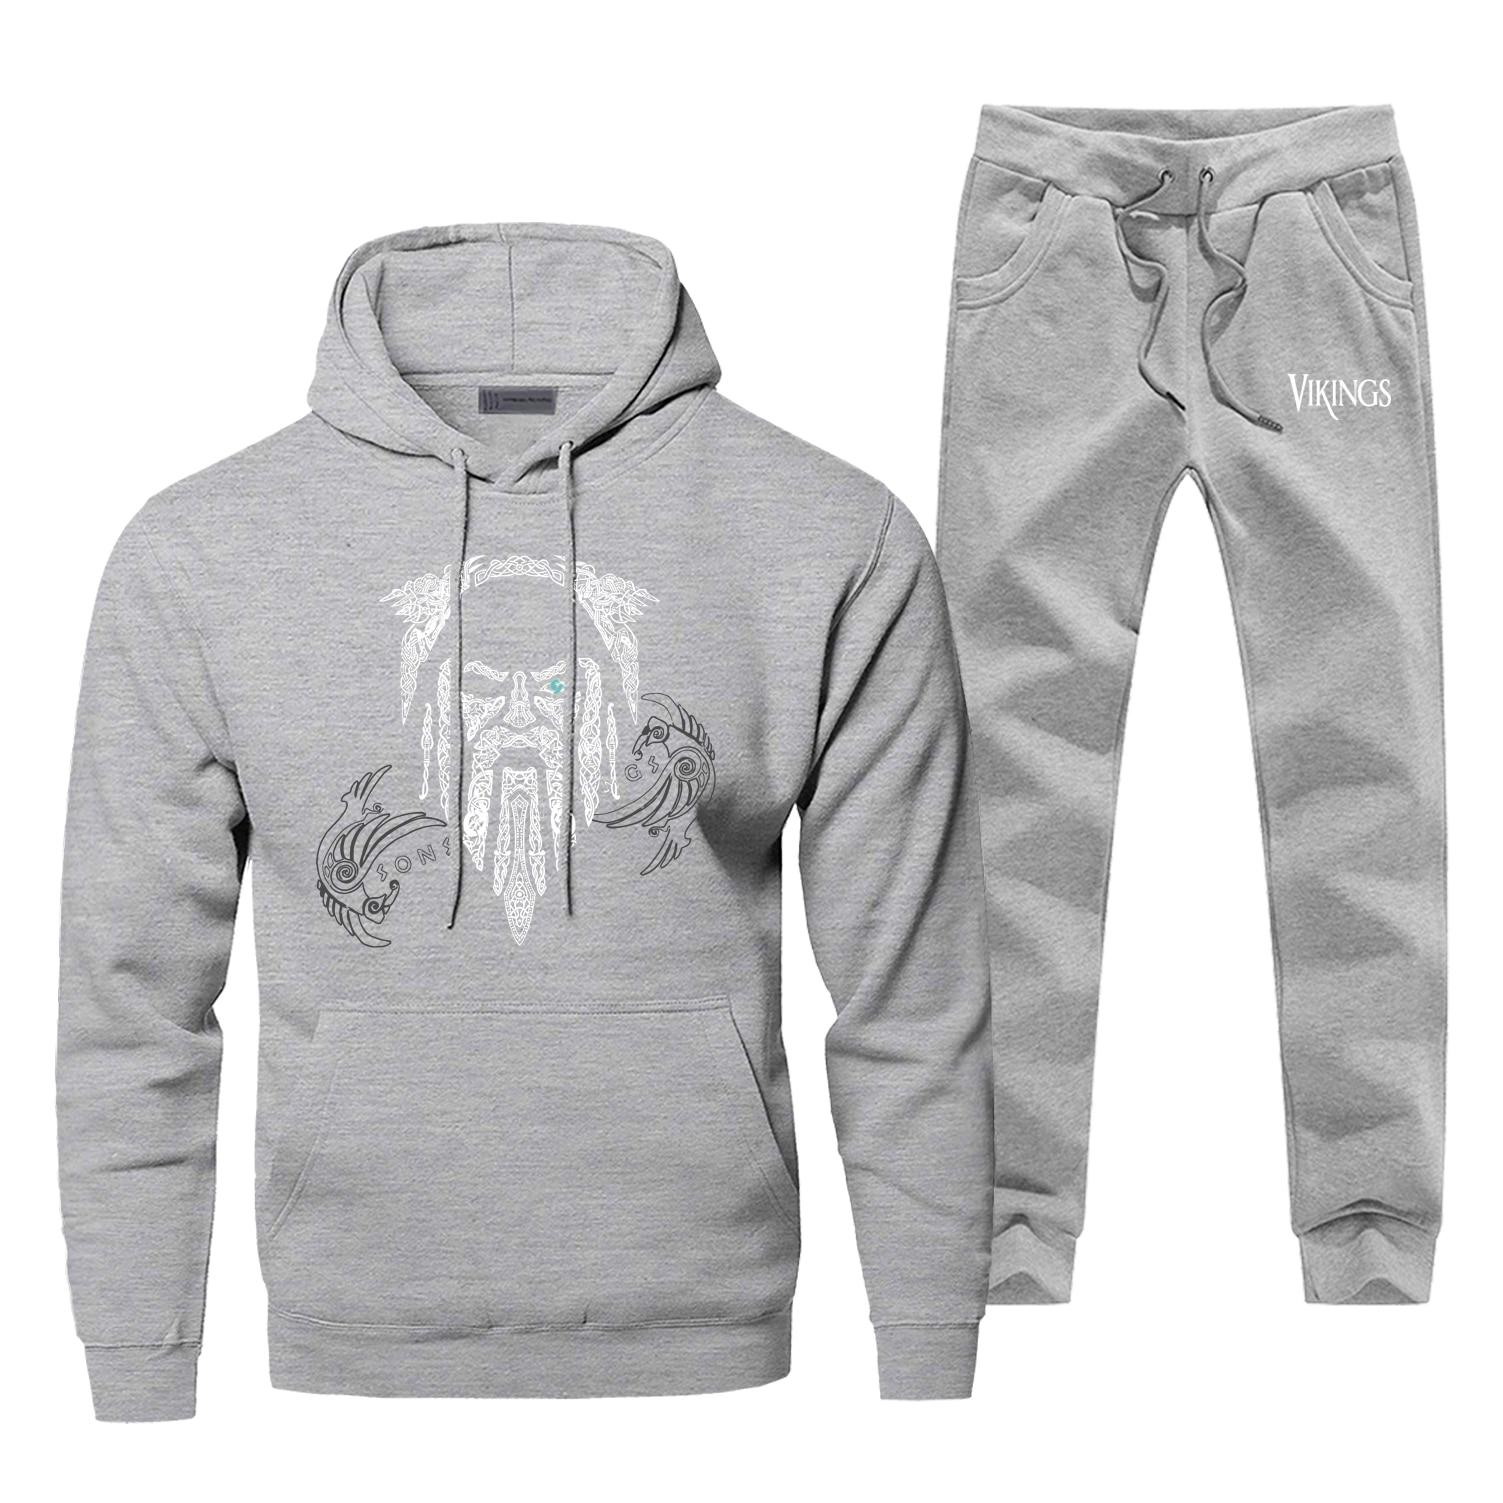 TV Show The Vikings Fleece Hoodies Set Fashion Comfortable Viking Pants Sweatshirt 2019 New Casual Ragnar Odin Men's Jogging